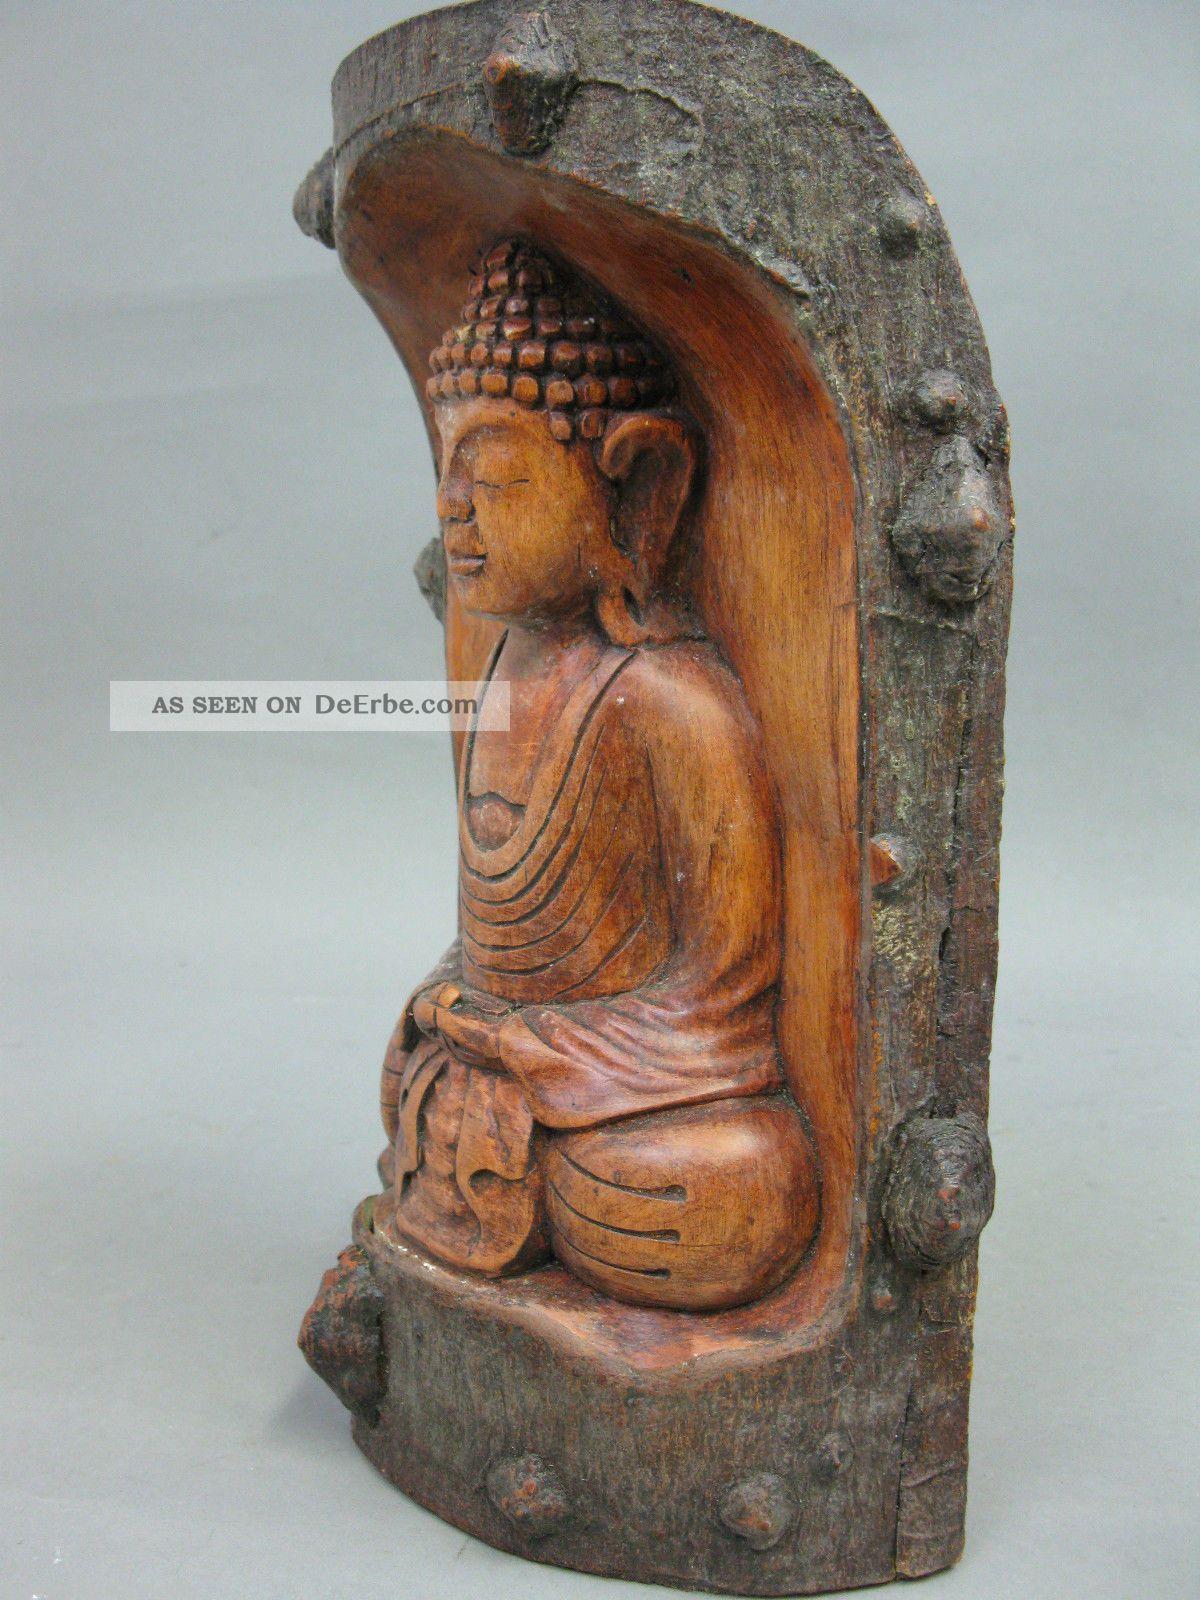 geschnitzter buddha aus holz 26cm hoch buddha figur. Black Bedroom Furniture Sets. Home Design Ideas